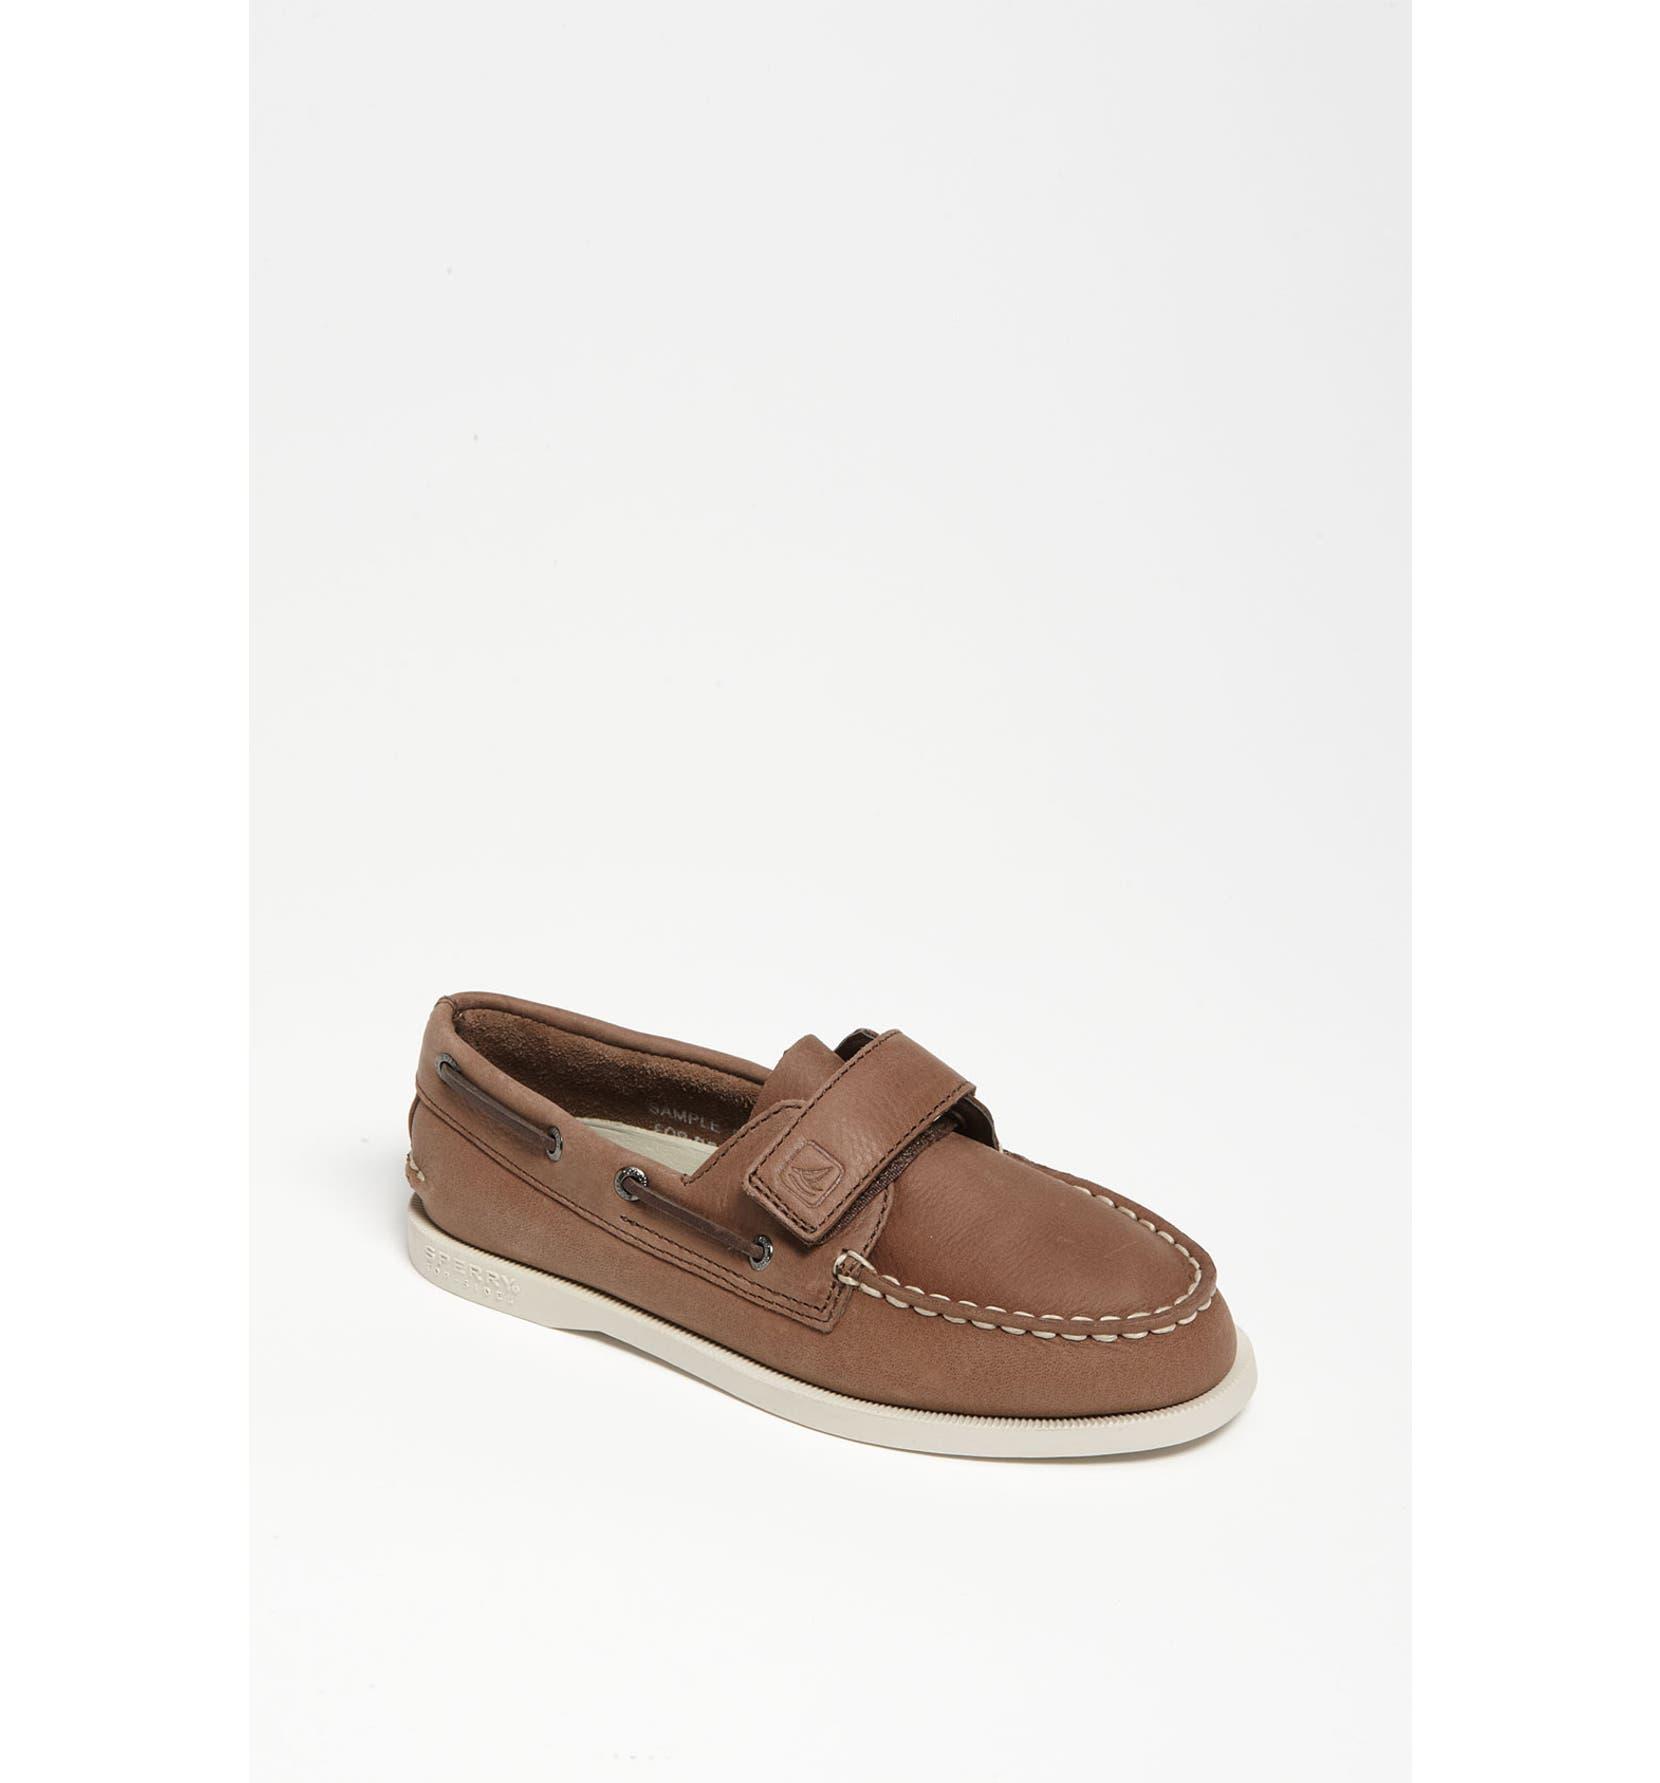 ecd43663c26e Sperry Top-Sider® Kids  Authentic Original  Boat Shoe (Walker   Toddler)